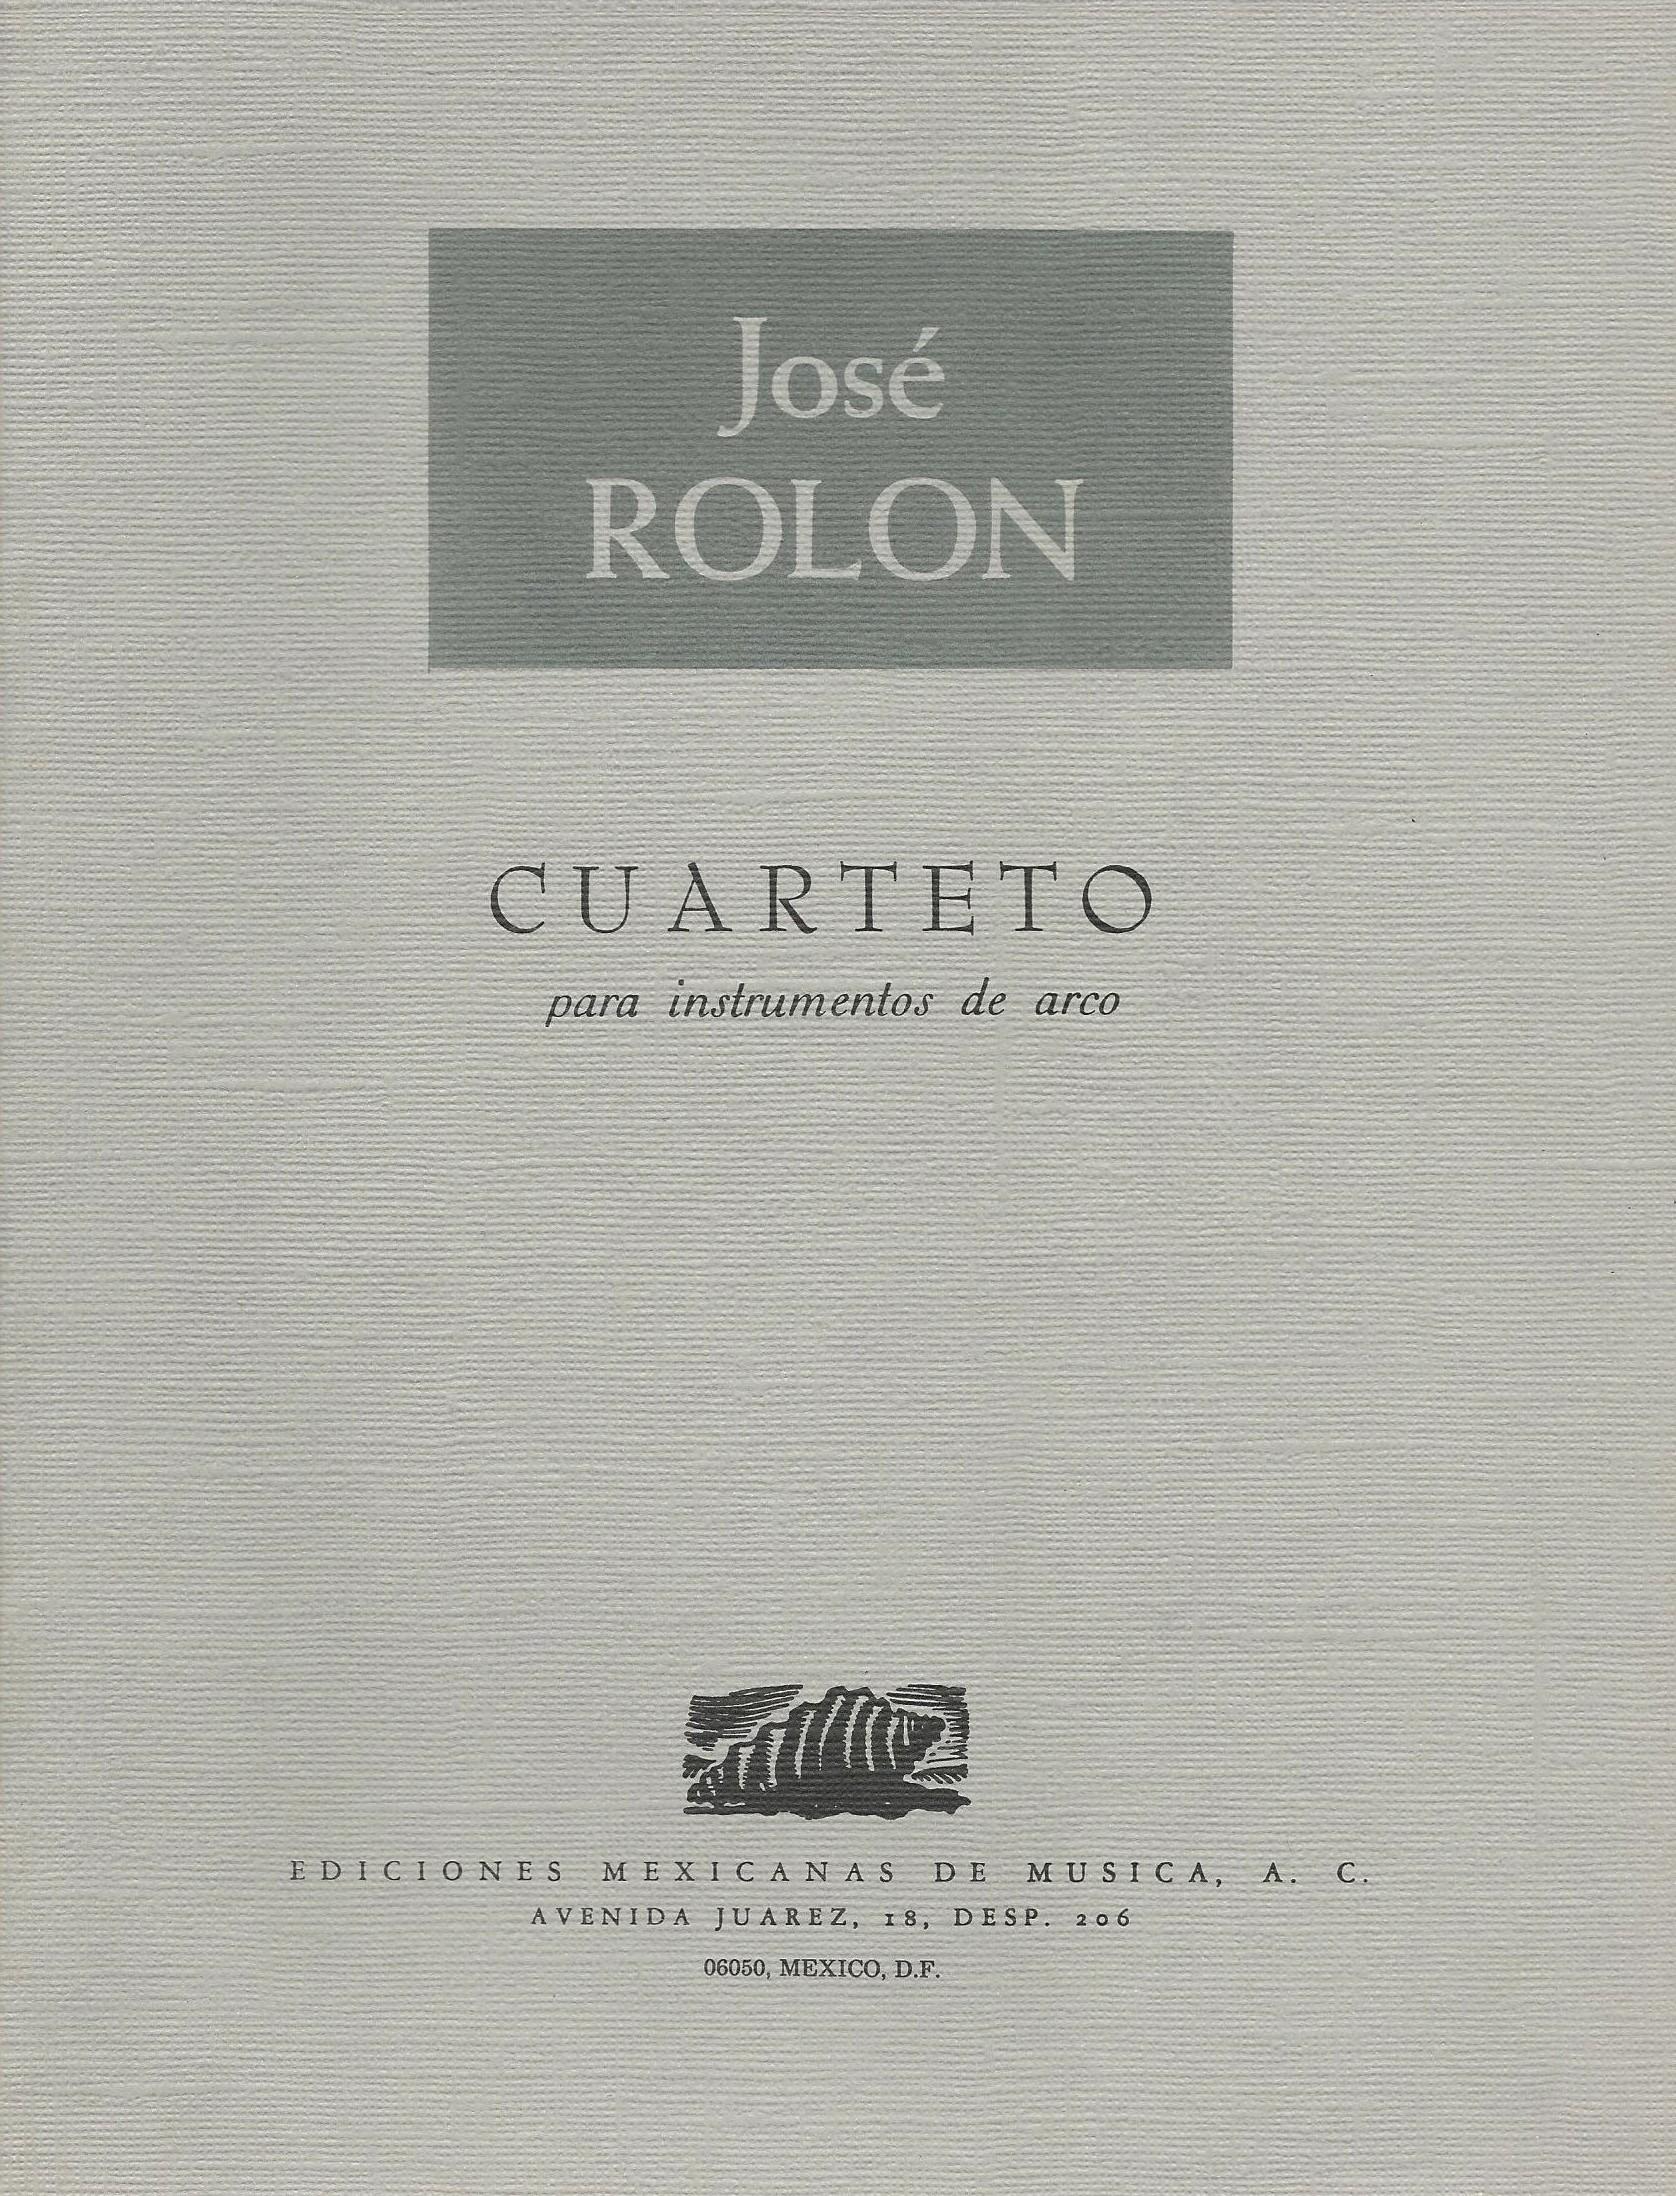 Rolón_-_Cuarteto_para_instrumentos_de_arco_01.jpg